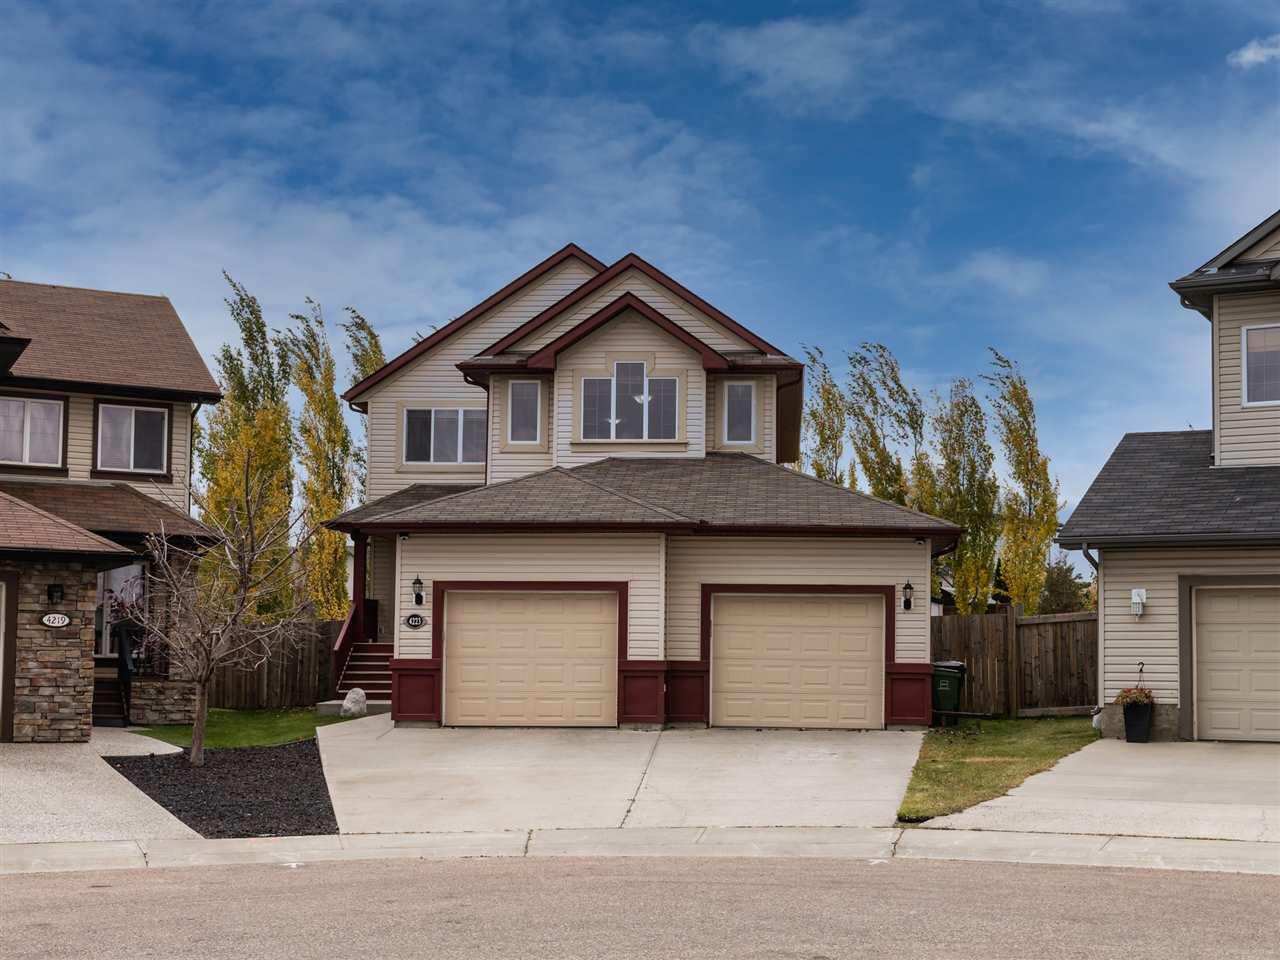 Main Photo: 4223 157 Avenue in Edmonton: Zone 03 House for sale : MLS®# E4218503